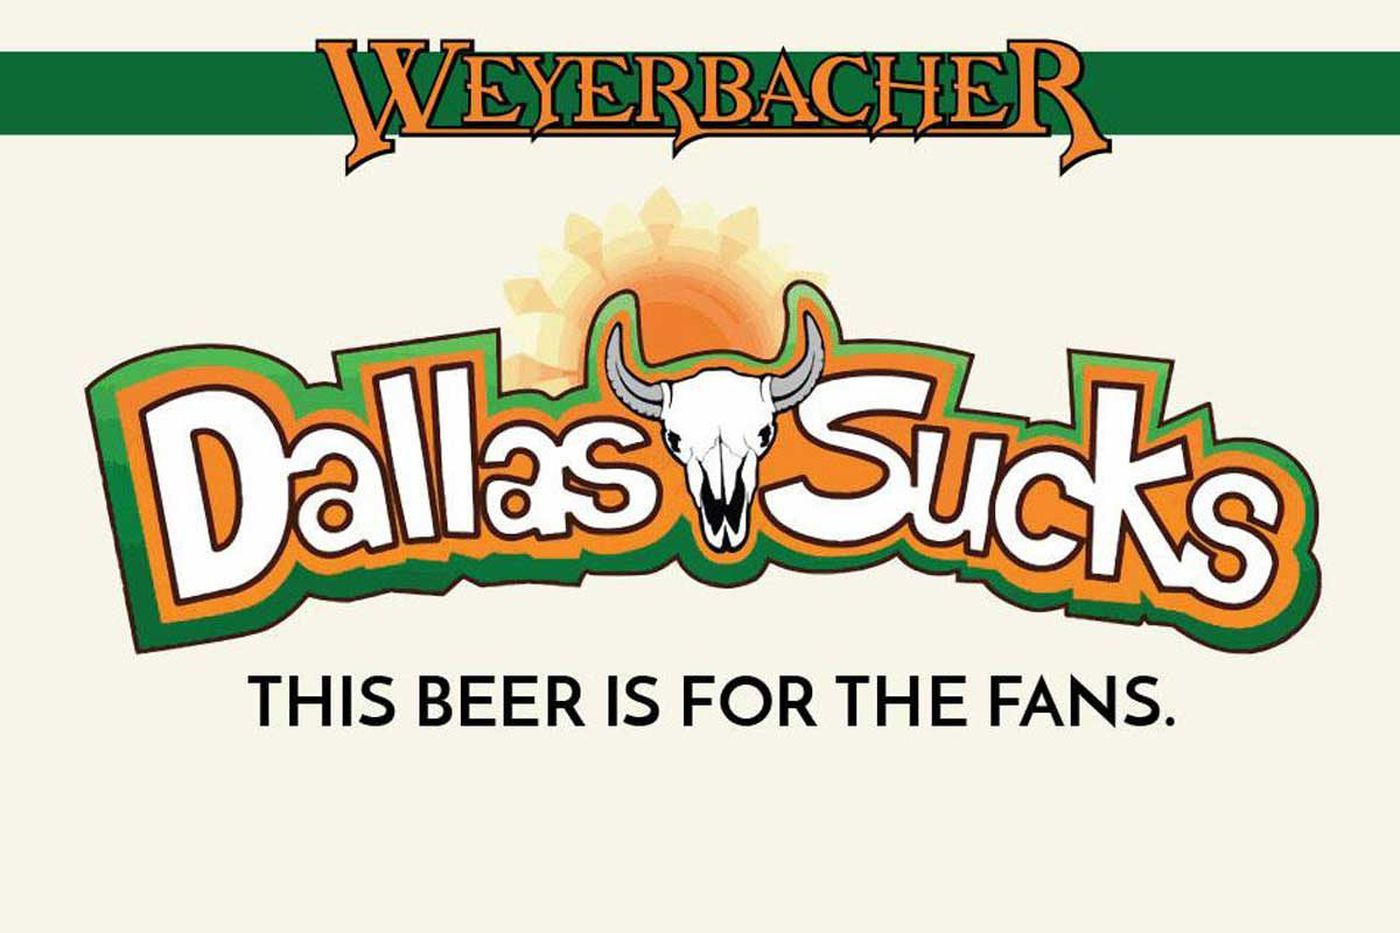 Weyerbacher's new 'Dallas Sucks' beer riles up humorless Cowboys fans